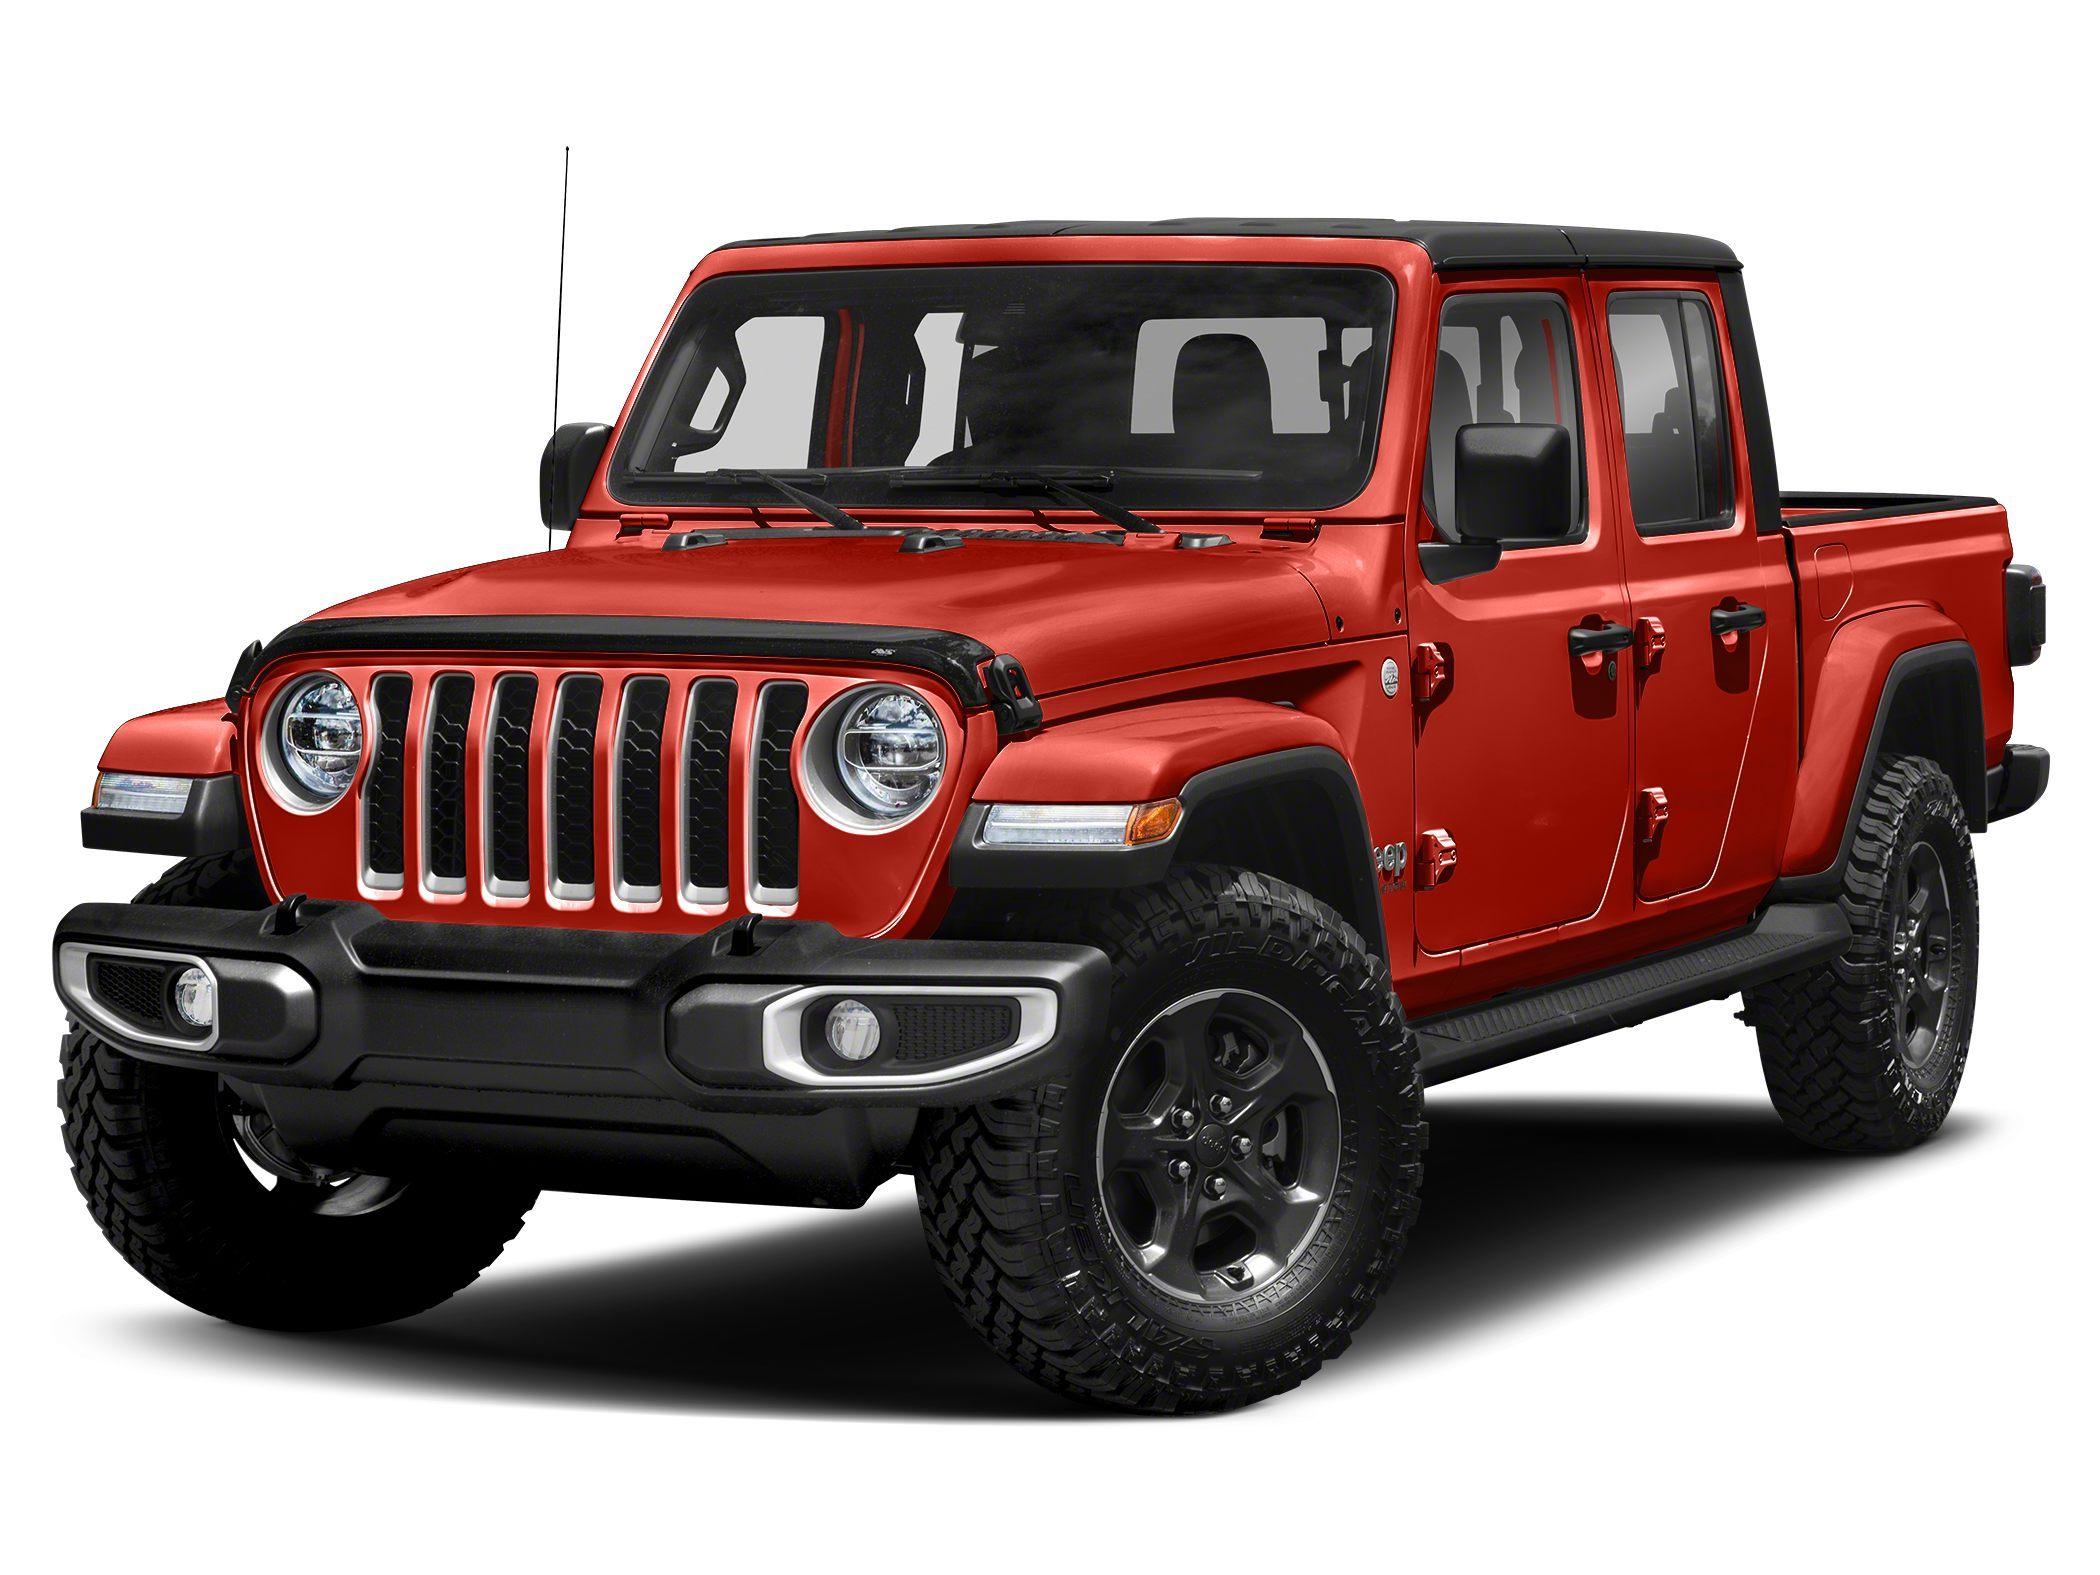 2021 Jeep Gladiator 4x4 Crew Cab 5 ft. box